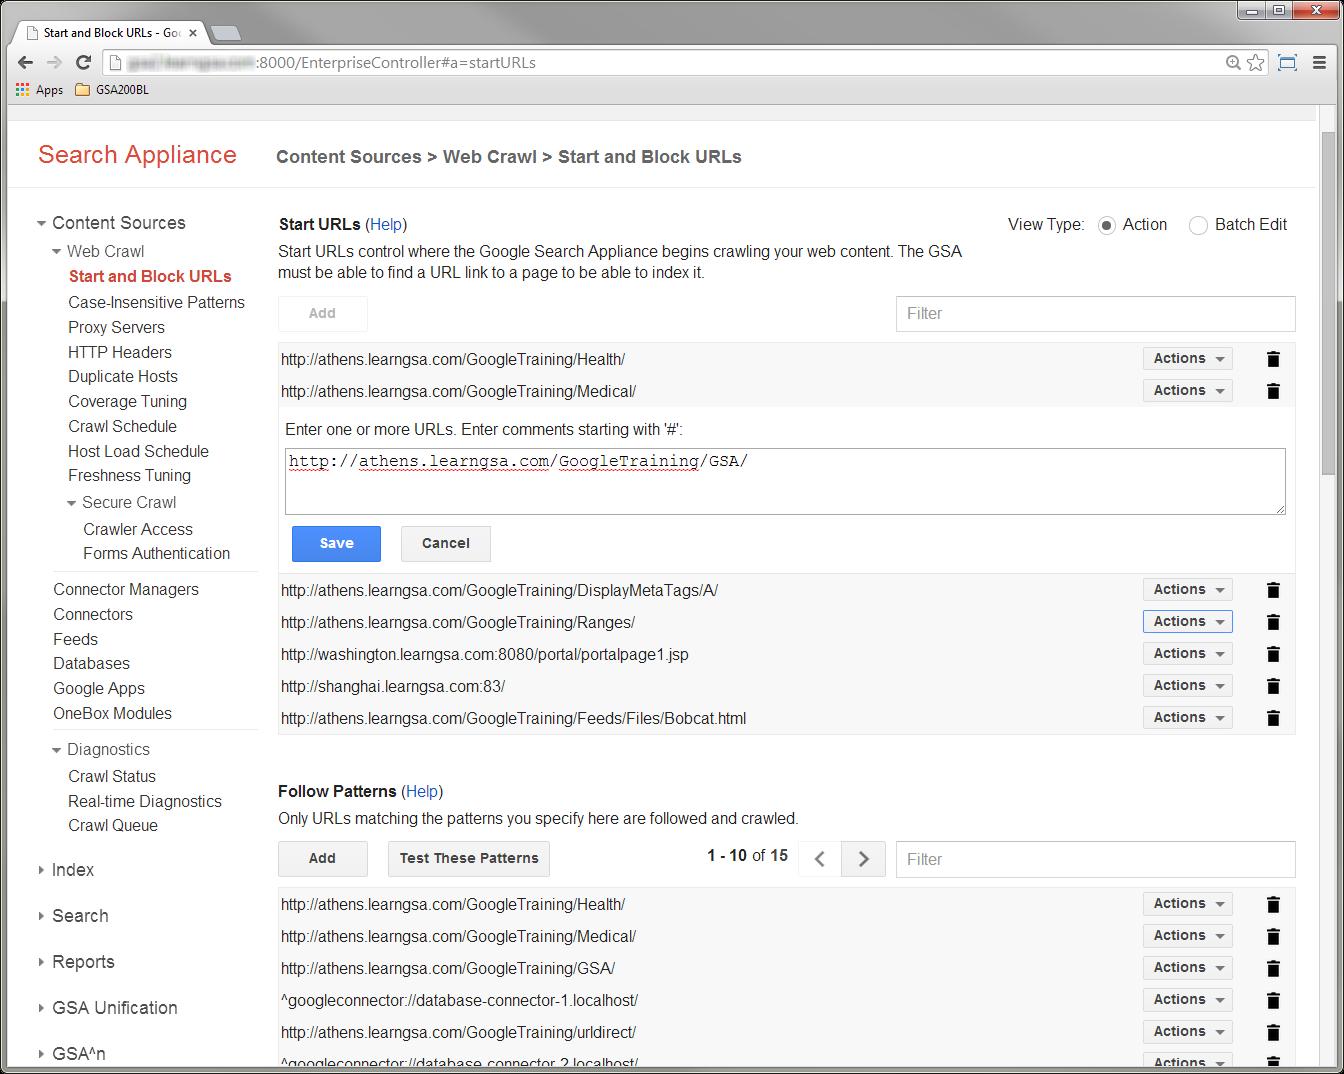 GSA 7.2 - editing a single Start URL